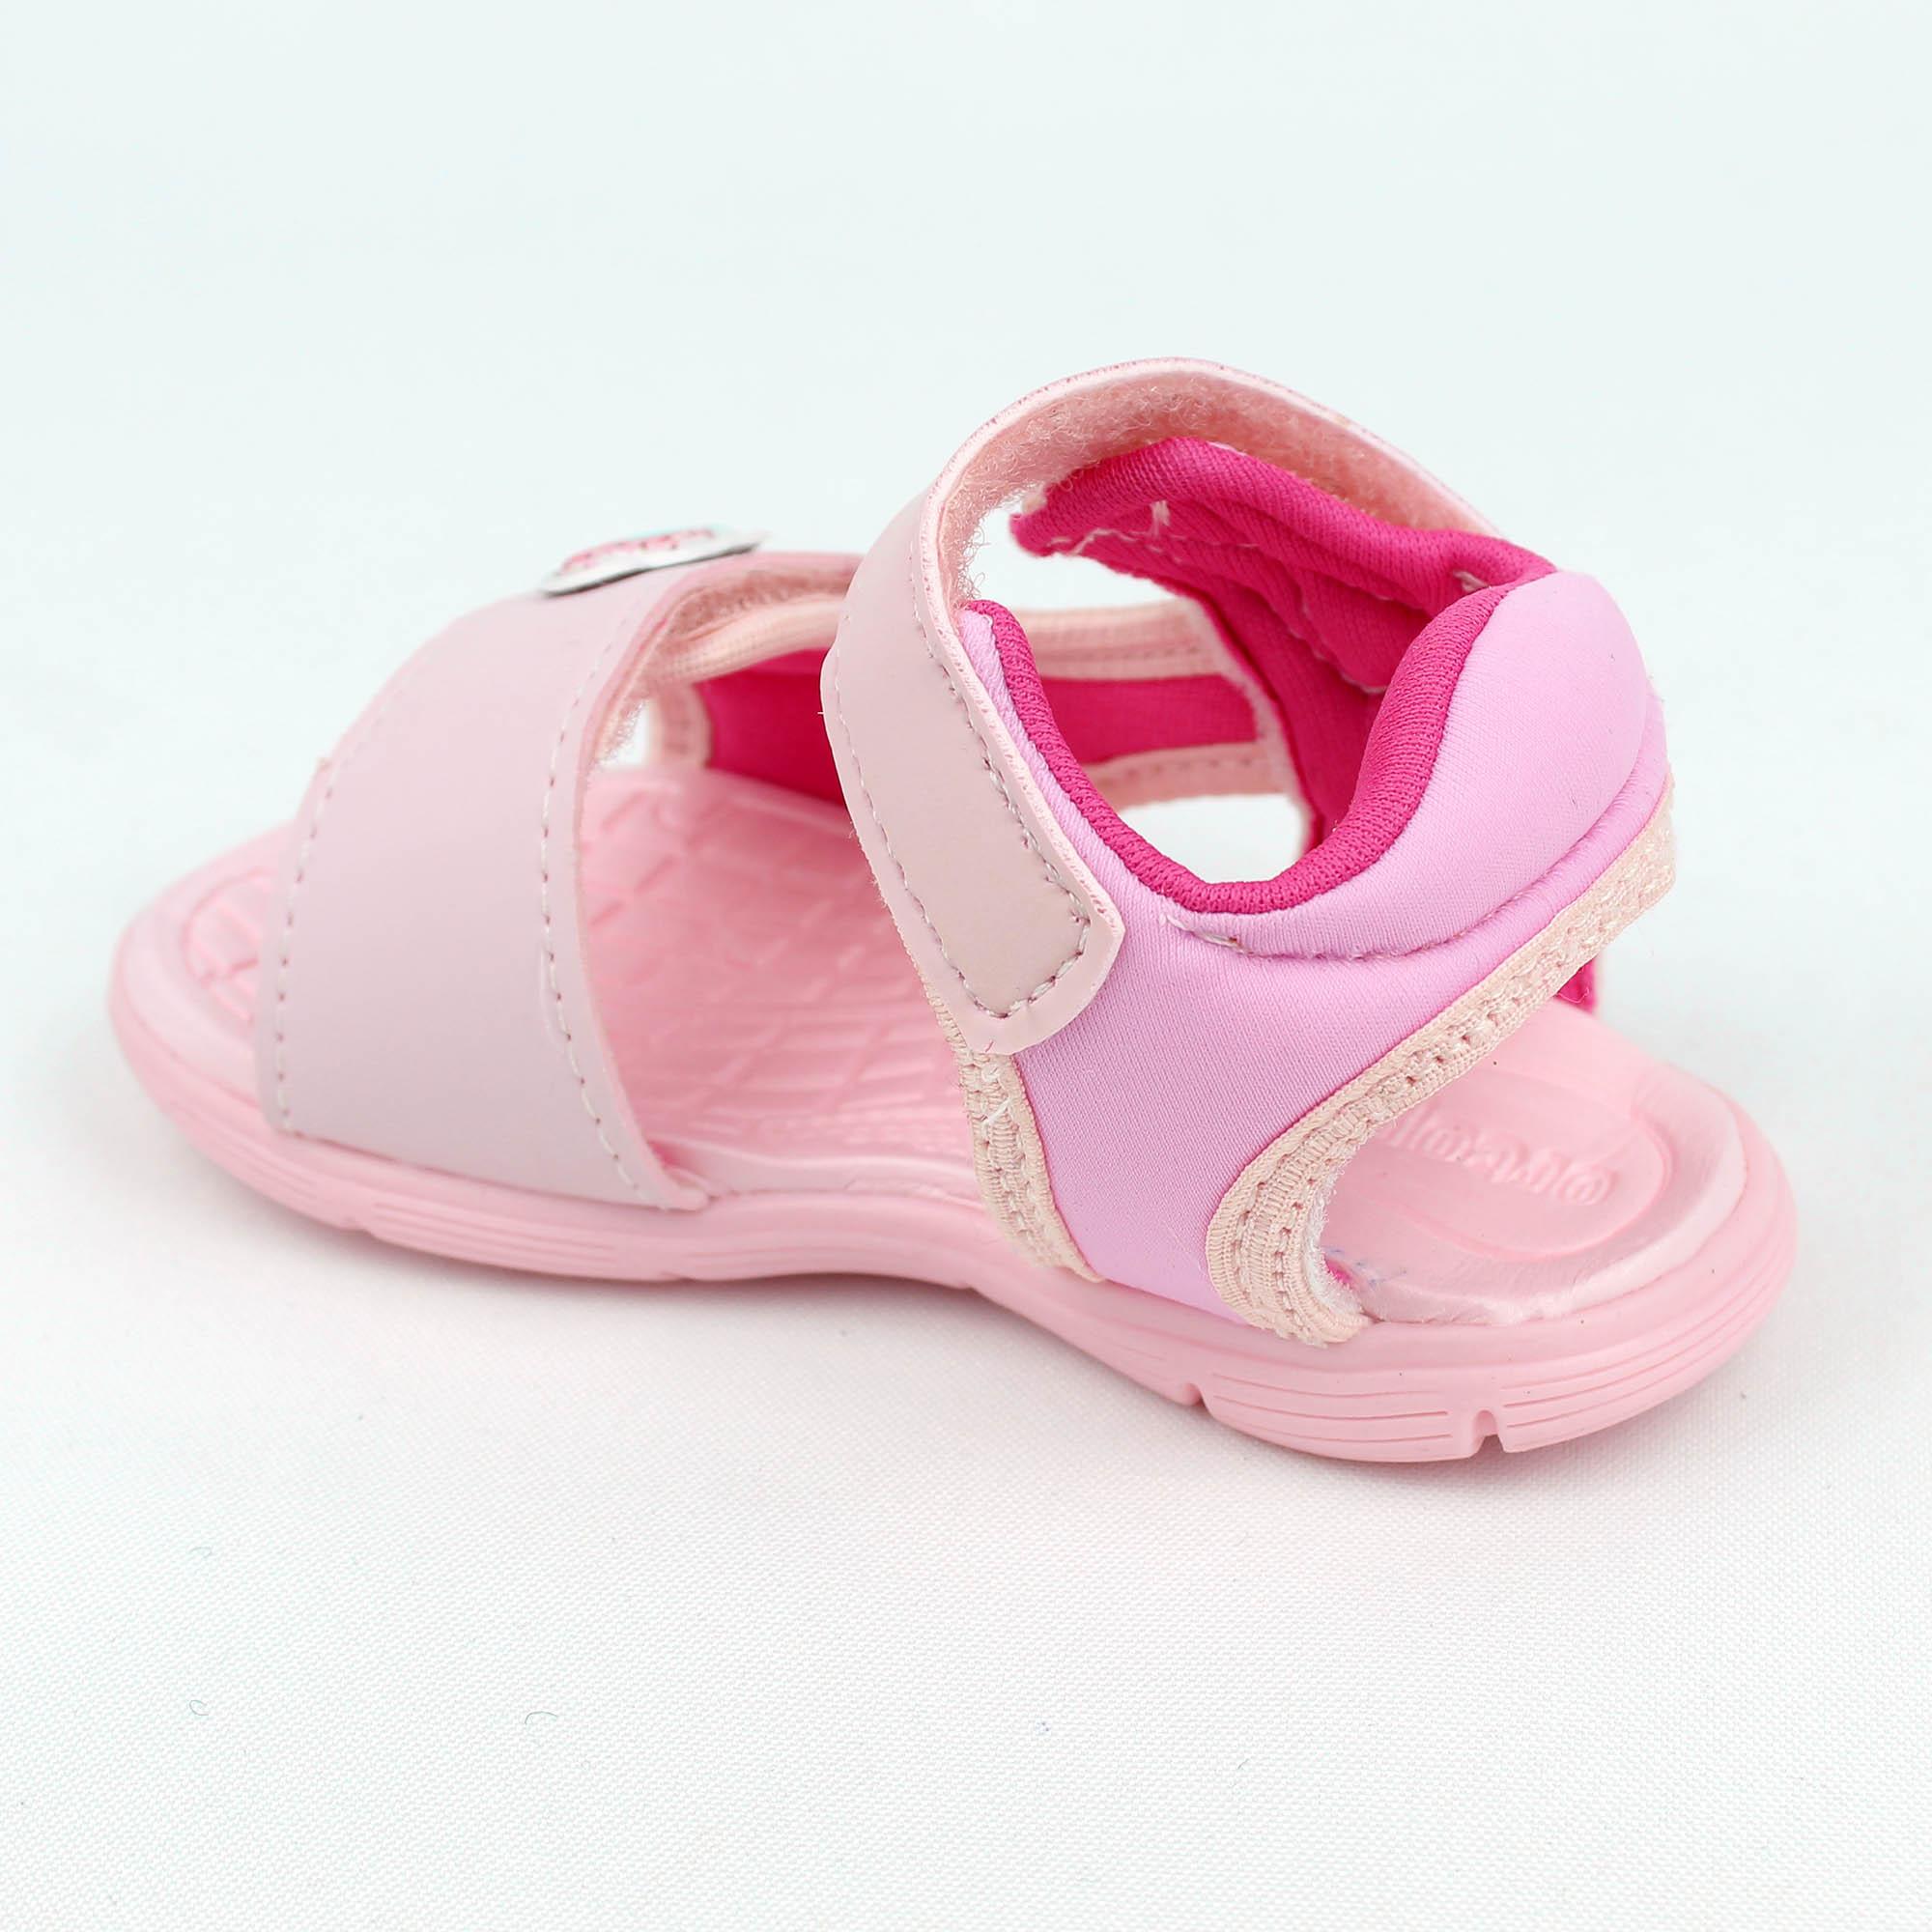 Sandália Bebê Ortopé Brincadeira 237062 Menina